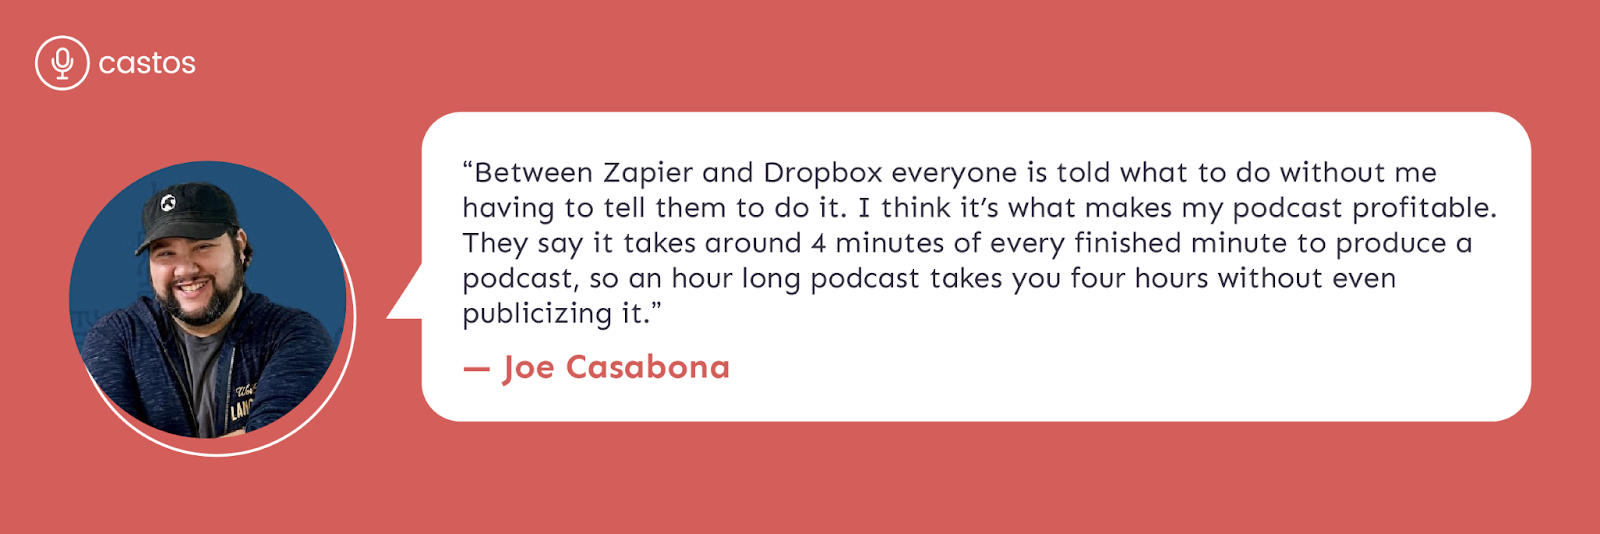 Joe Casabona Zapier testimonial